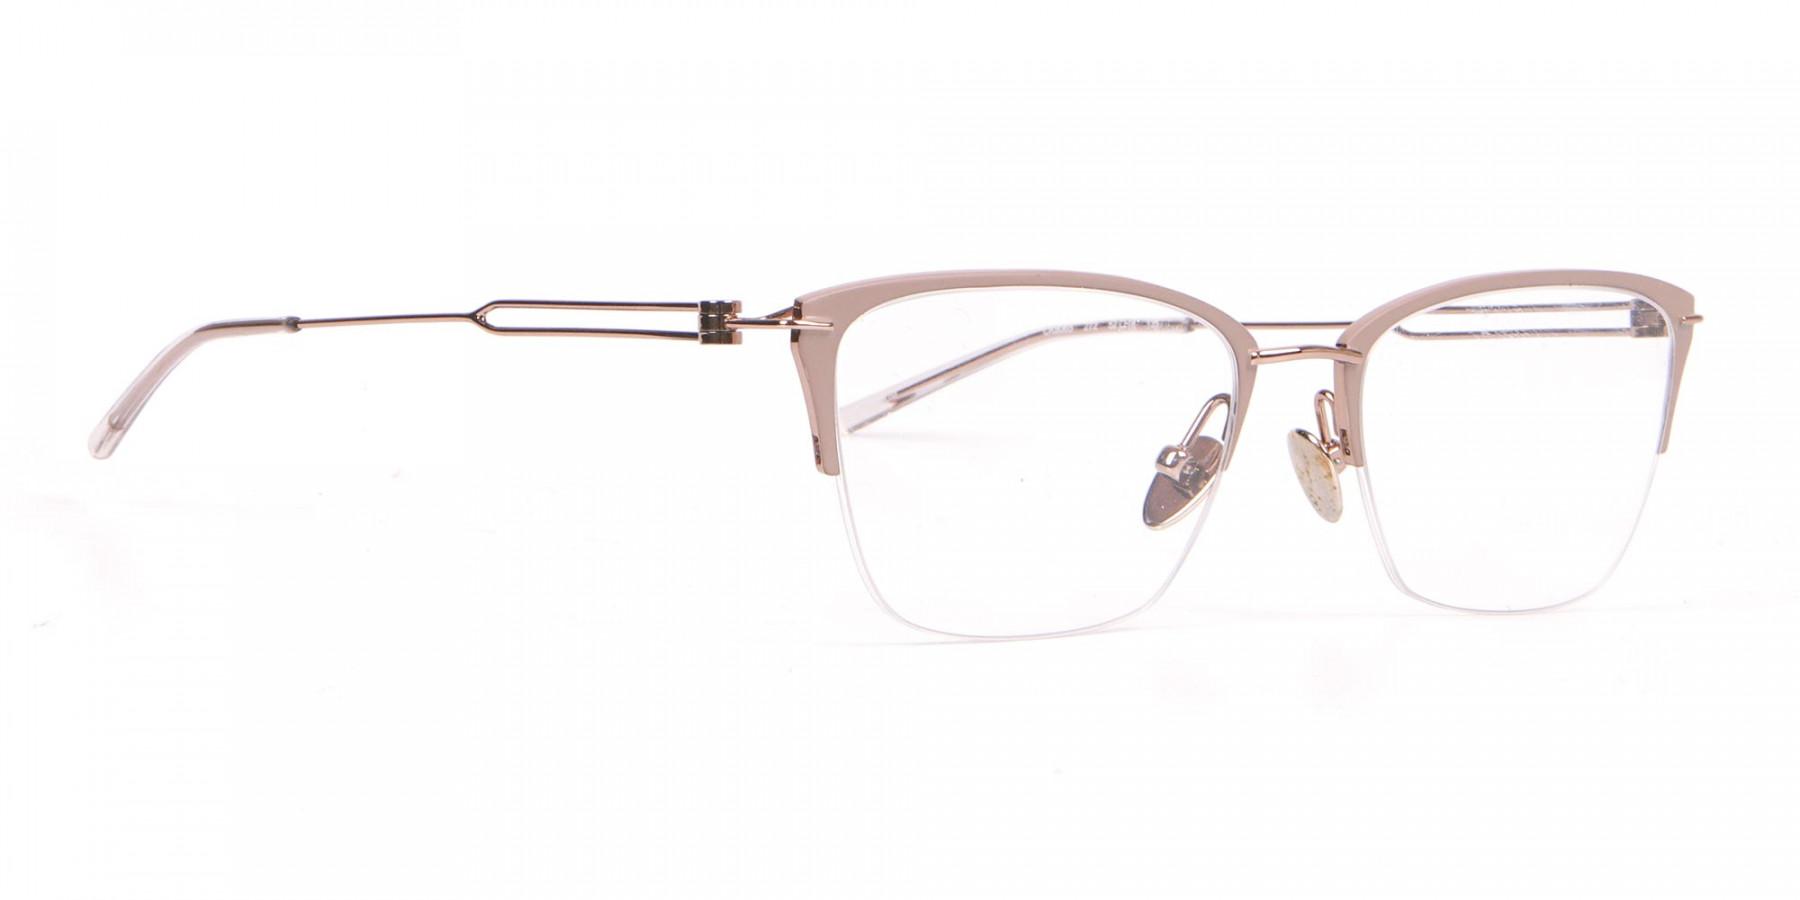 Calvin Klein CK8065 Women Titanium Half-Rimmed Glasses Nude-1